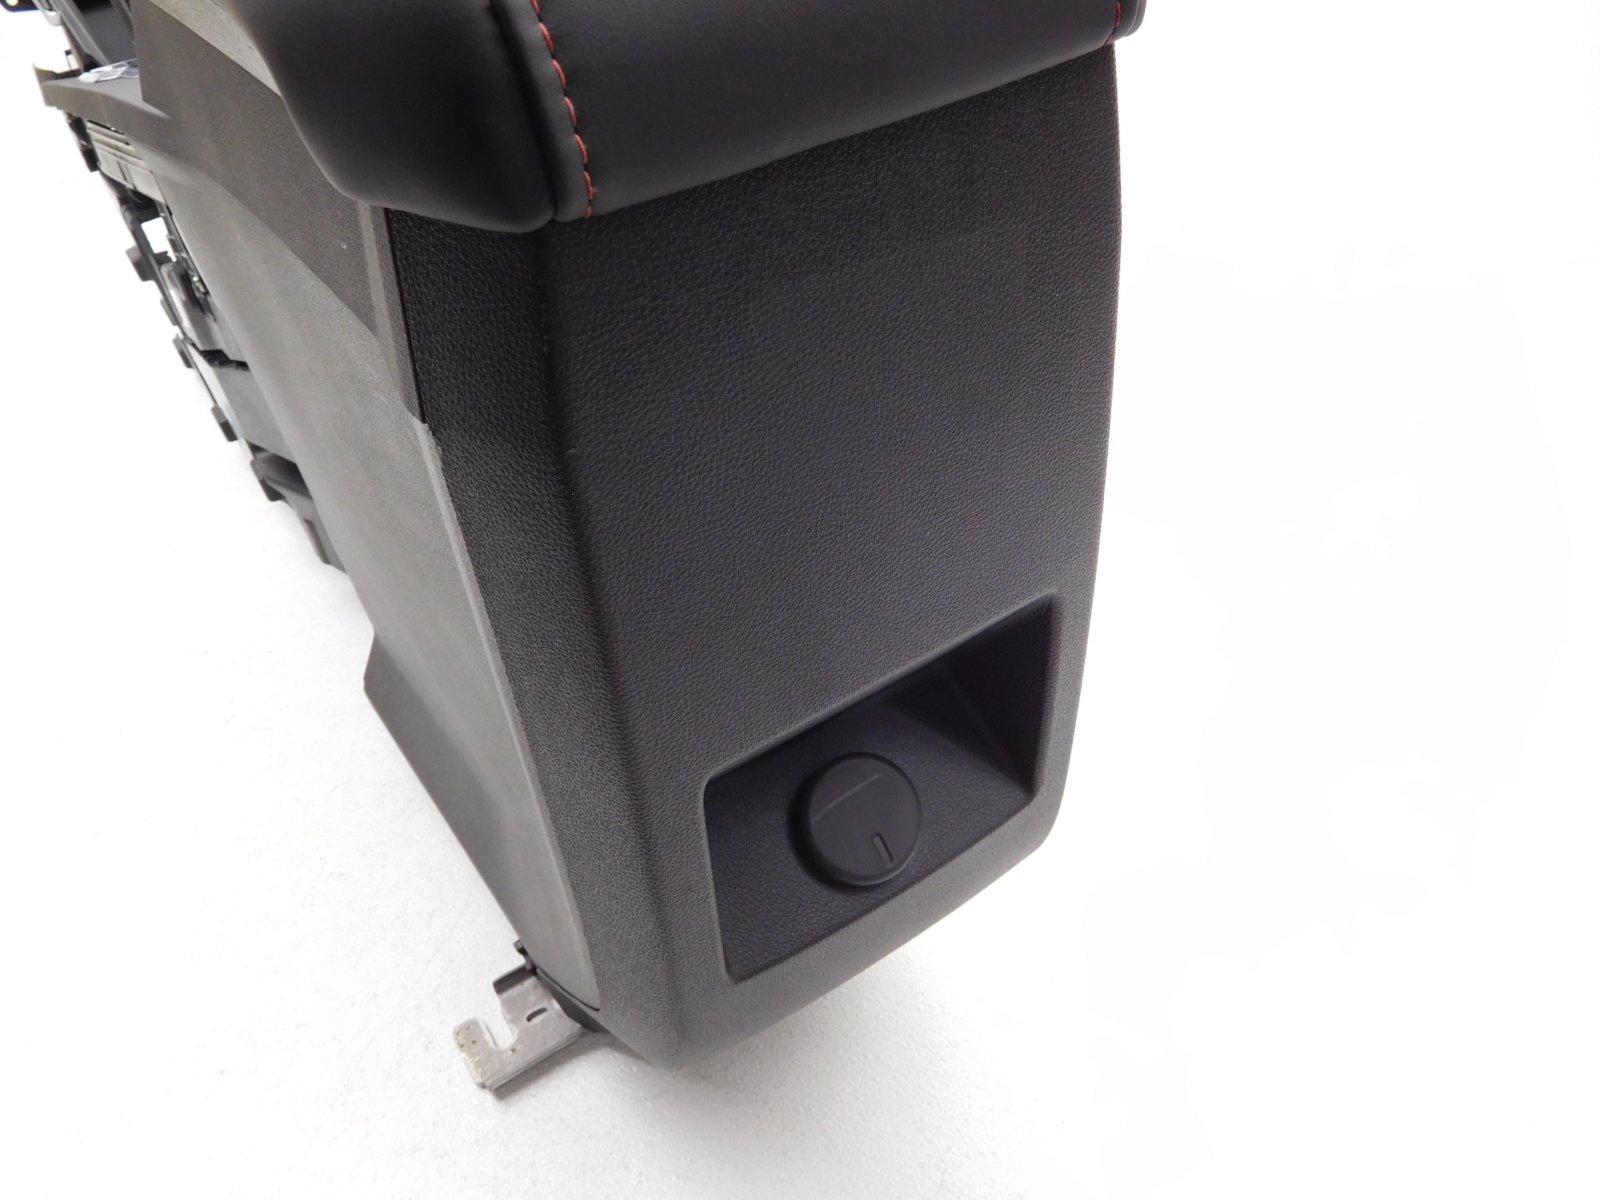 New OEM GMC Terrain 3.6L Floor Console Cream/Brownstone W/ Shift Knob 23157428